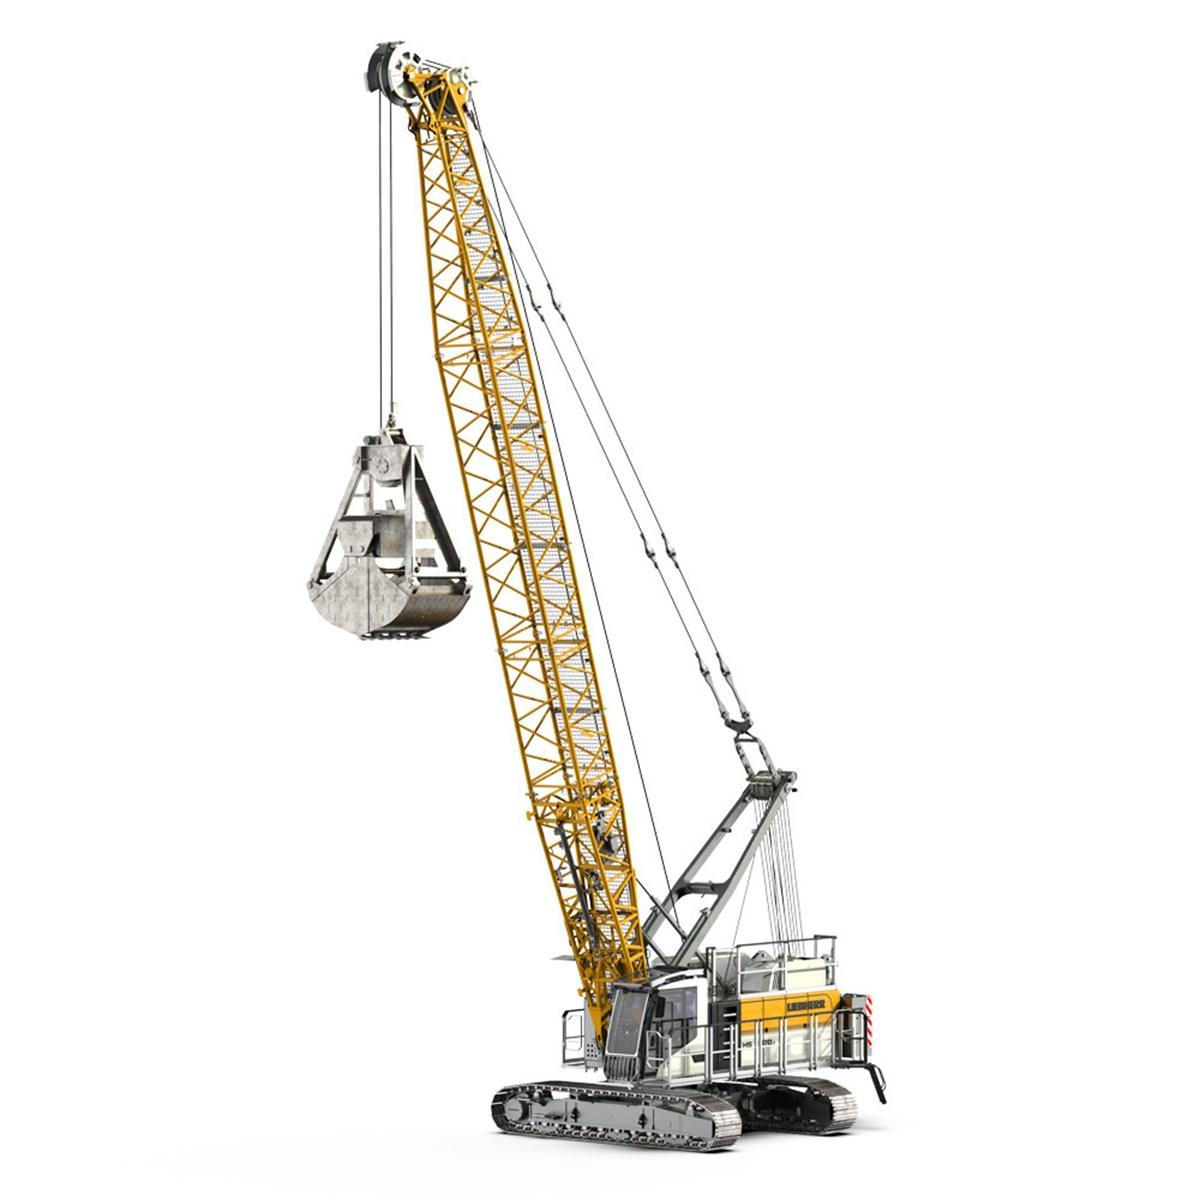 liebherr-hs-8070-1-seilbagger-duty-cycle-crawler-crane-mechanic-grab-greifer.jpg